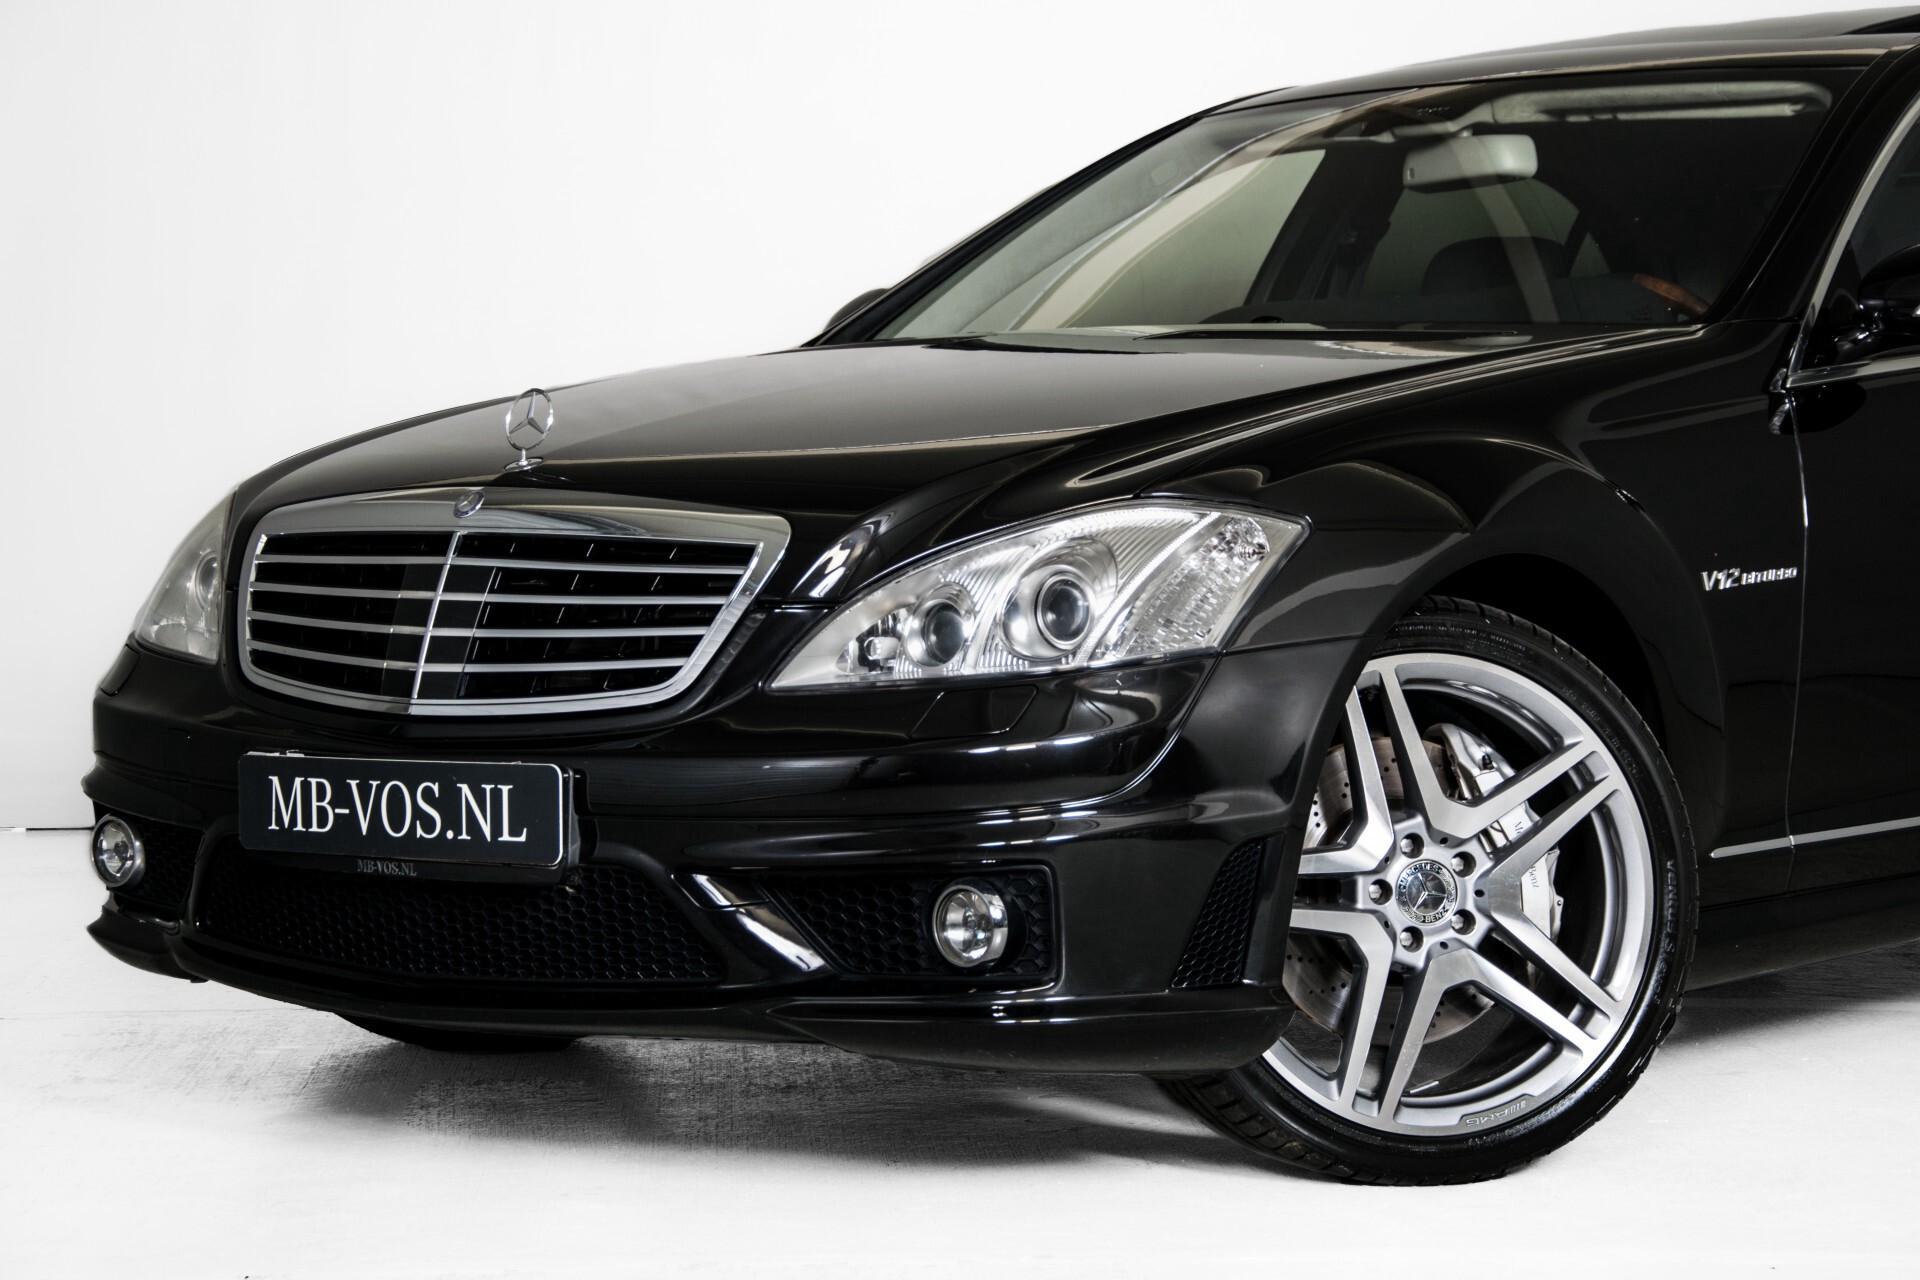 Mercedes-Benz S-Klasse 600 Lang 65 AMG Bi-Turbo Prestige Plus Aut5 Foto 68